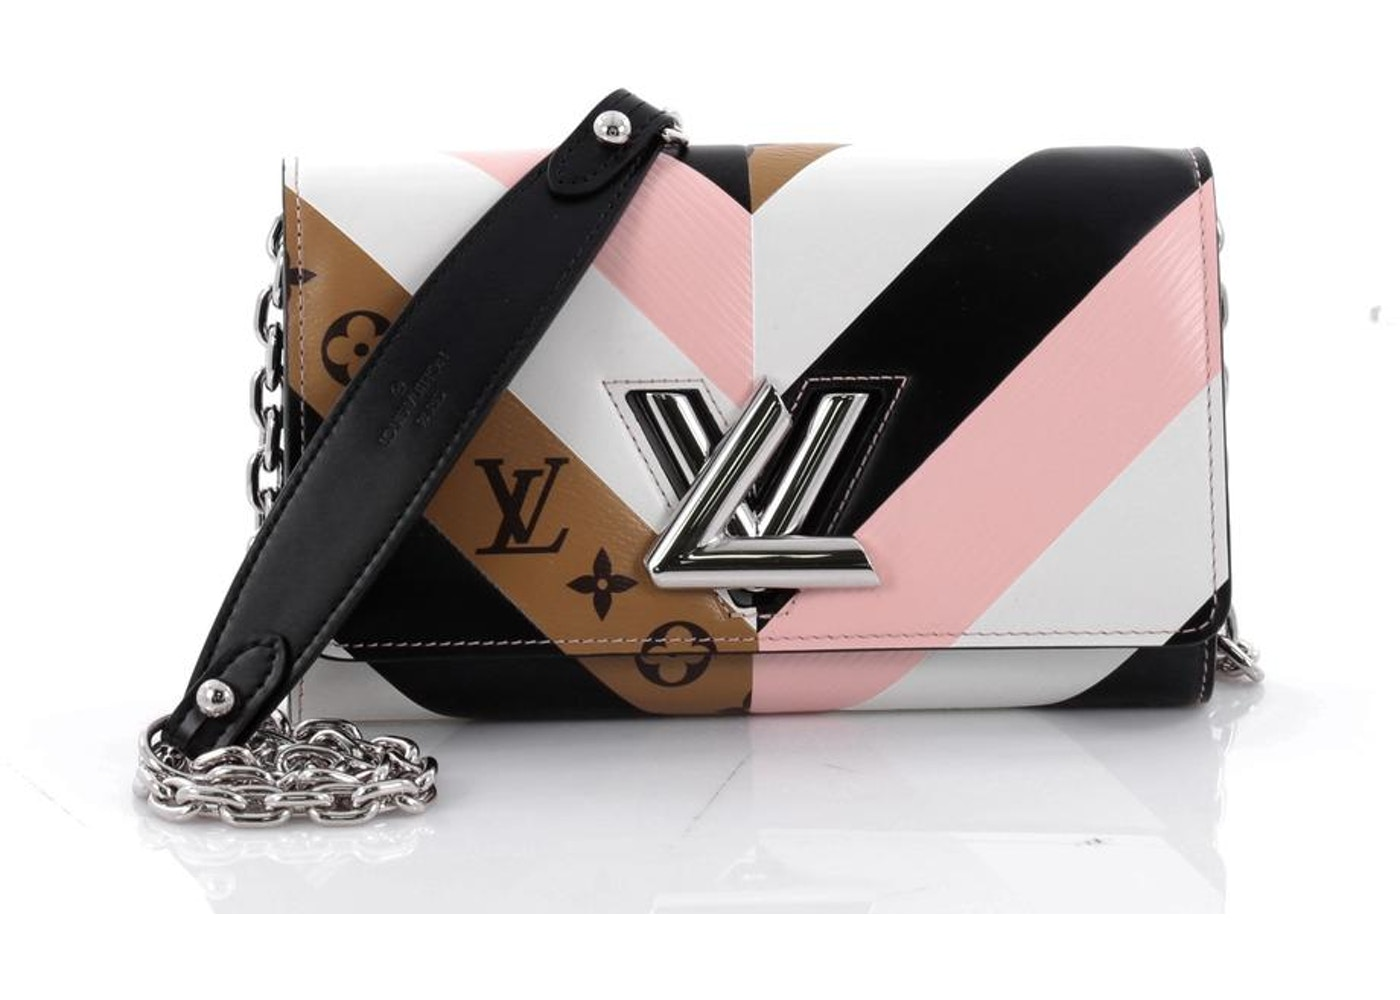 c690a9300d Louis Vuitton Chain Wallet Twist Epi/Monogram Pink/White/Black/Brown